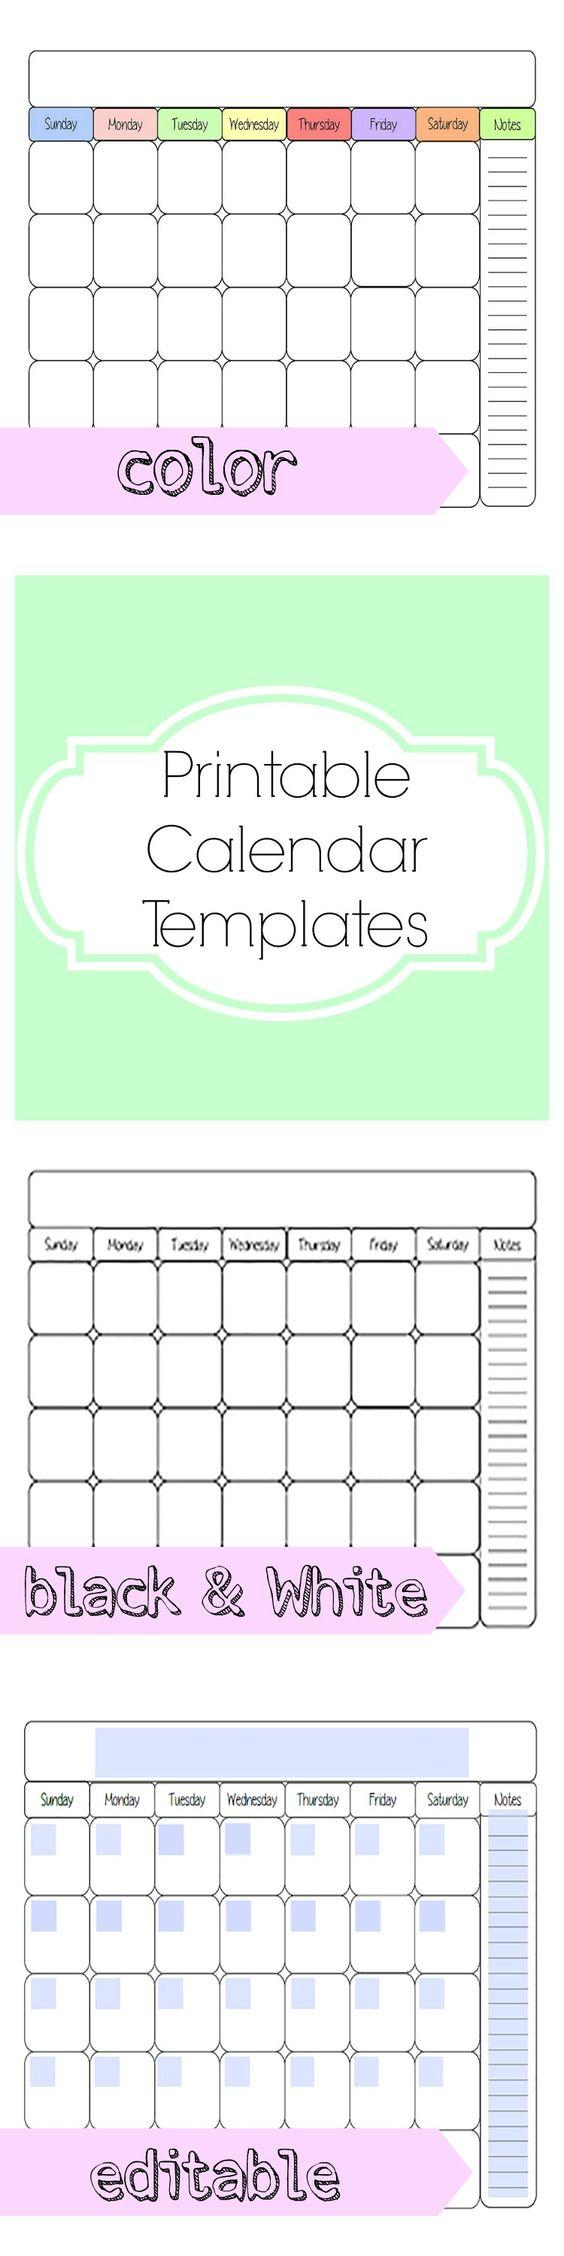 Diy Calendar Format : Calendar template for diy monthly at home work